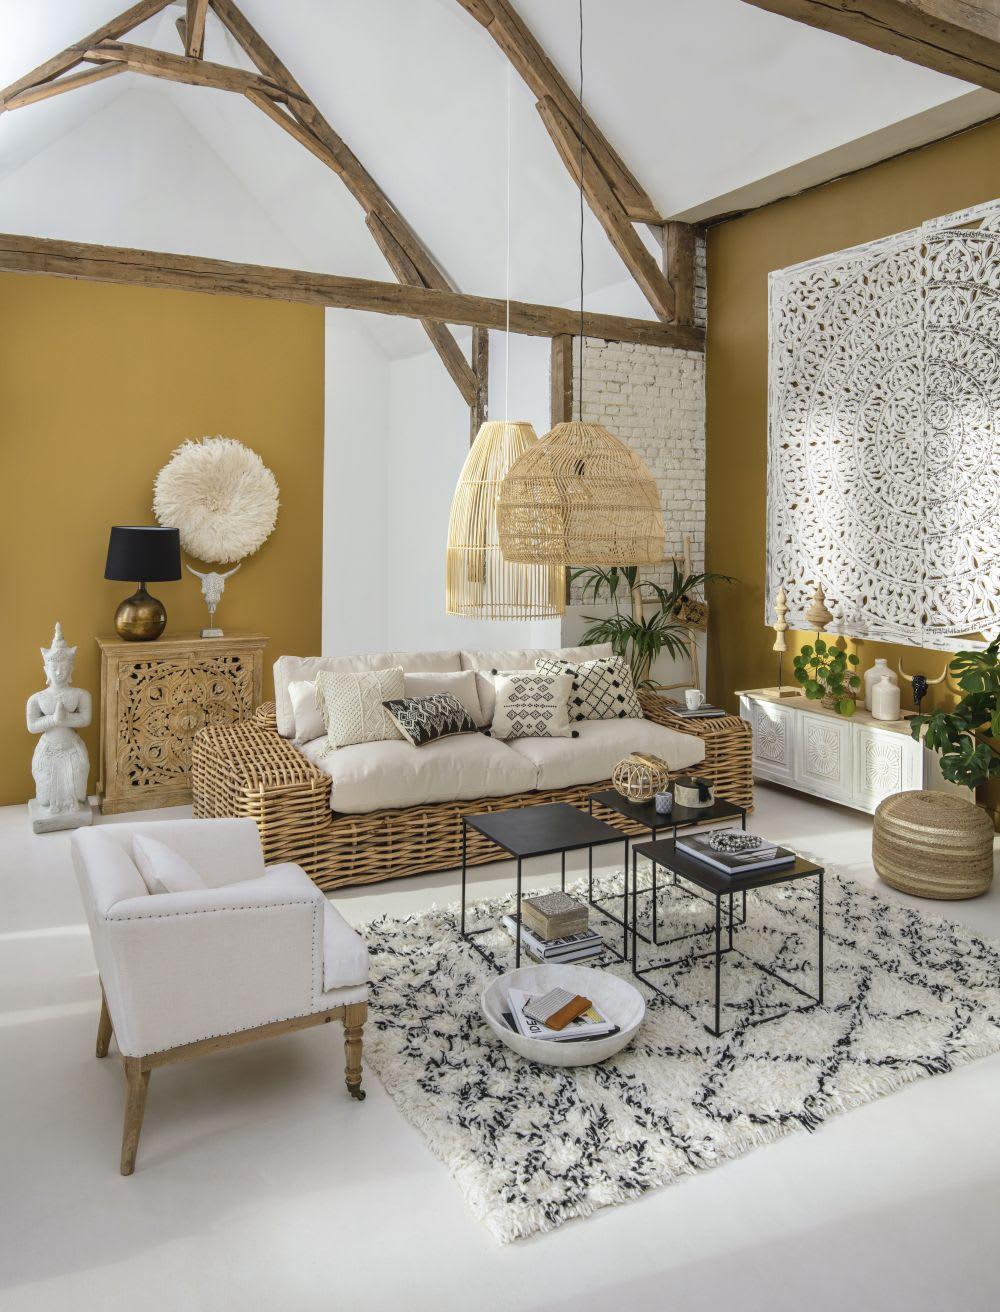 Cuscini Bianchi E Neri cuscino écru in lana e cotone con motivi neri 40x60cm | maisons du monde